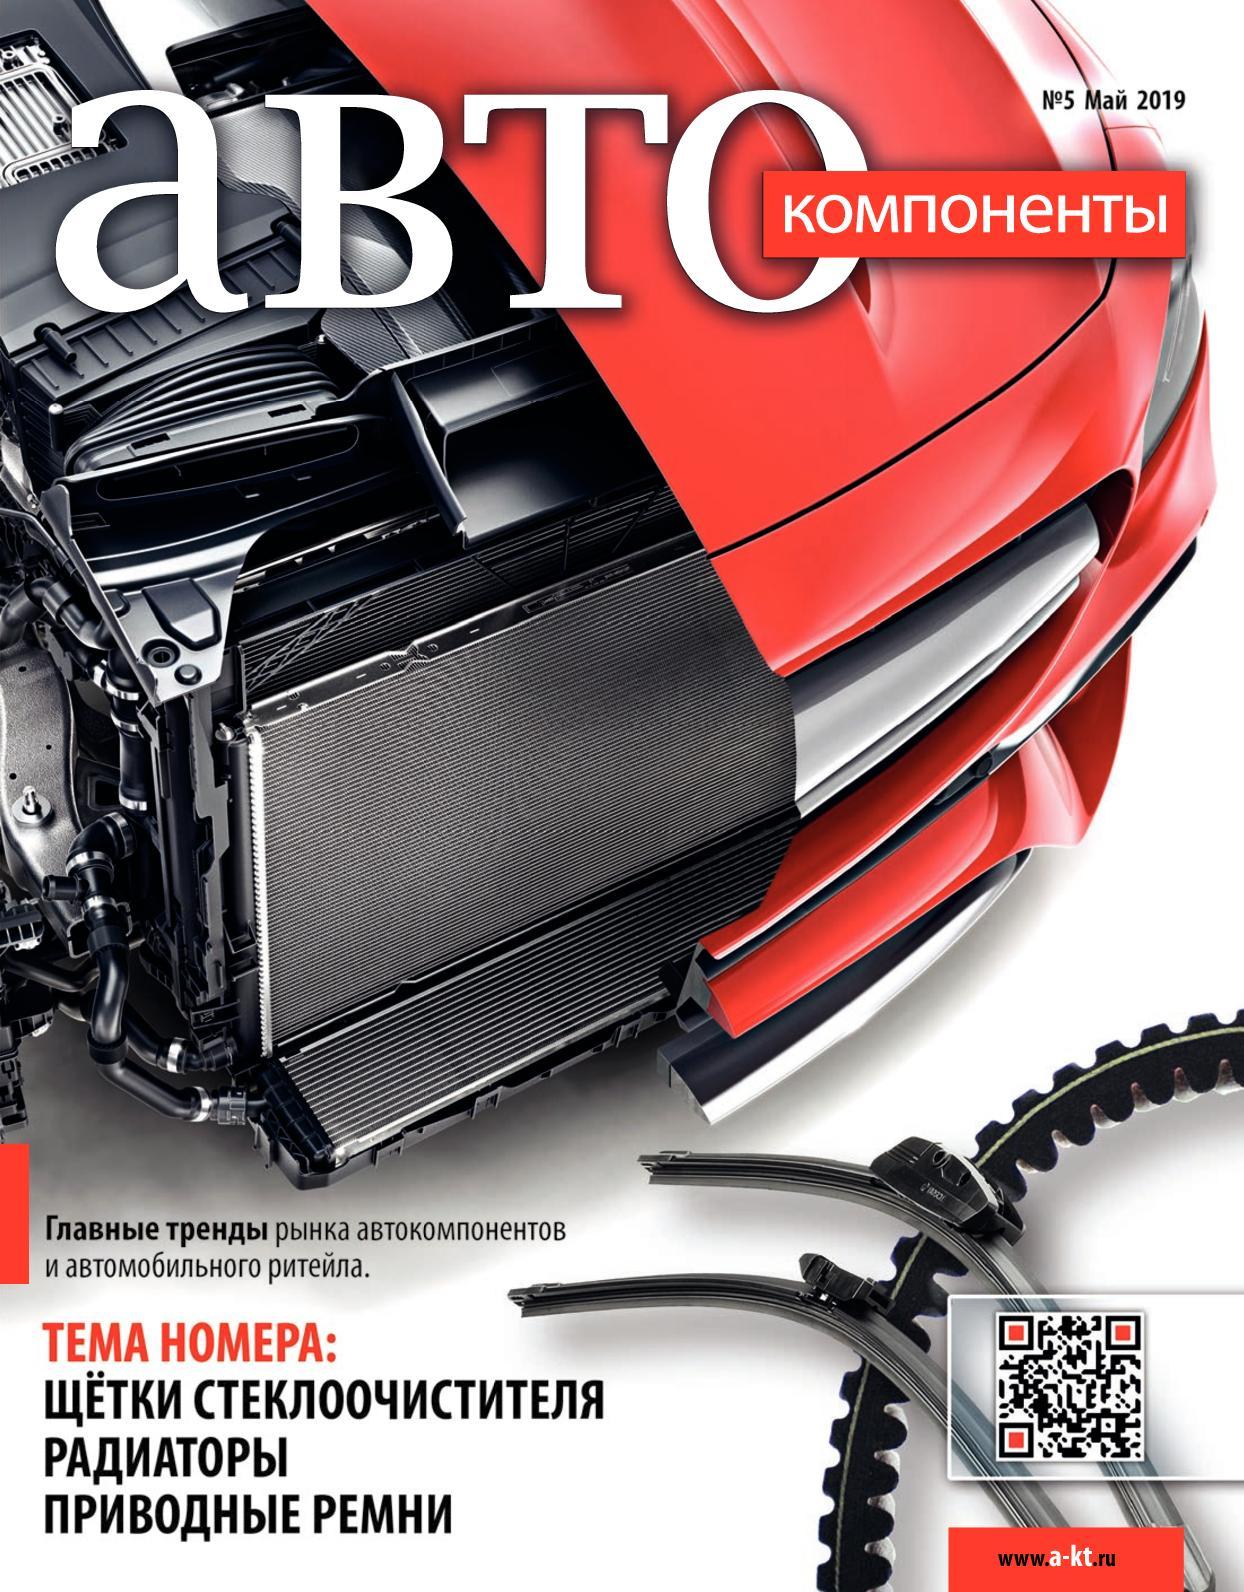 """АВТОКОМПОНЕНТЫ"" ЖУРНАЛ  №5/2019"